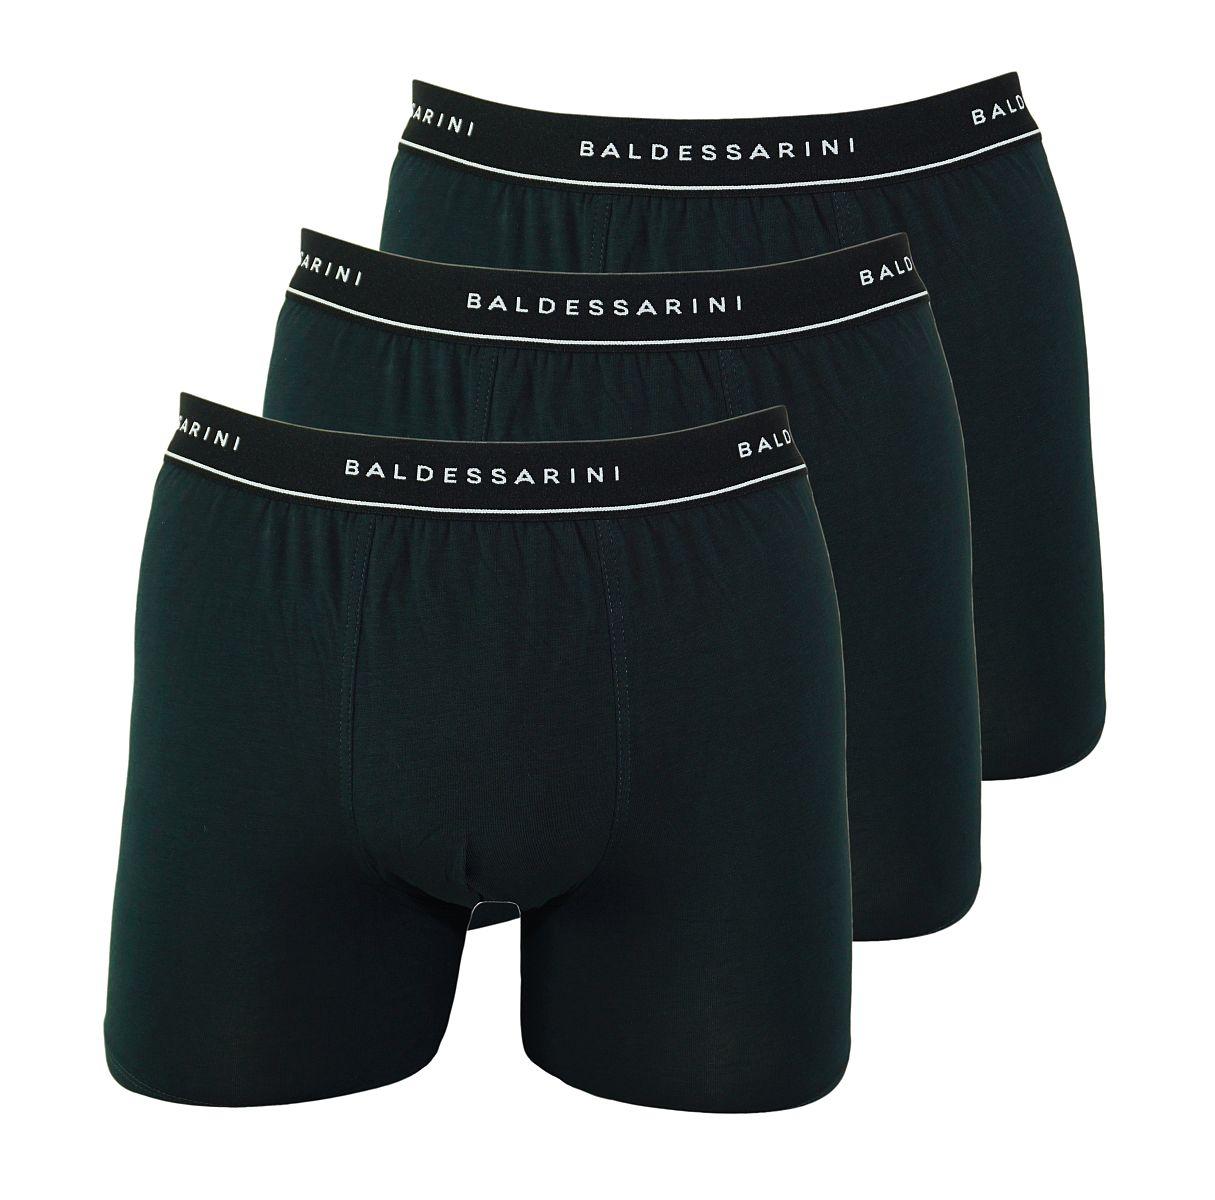 Baldessarini 3er Pack Shorts Boxershorts 90001 6061 9009 jet black W18-BSS1